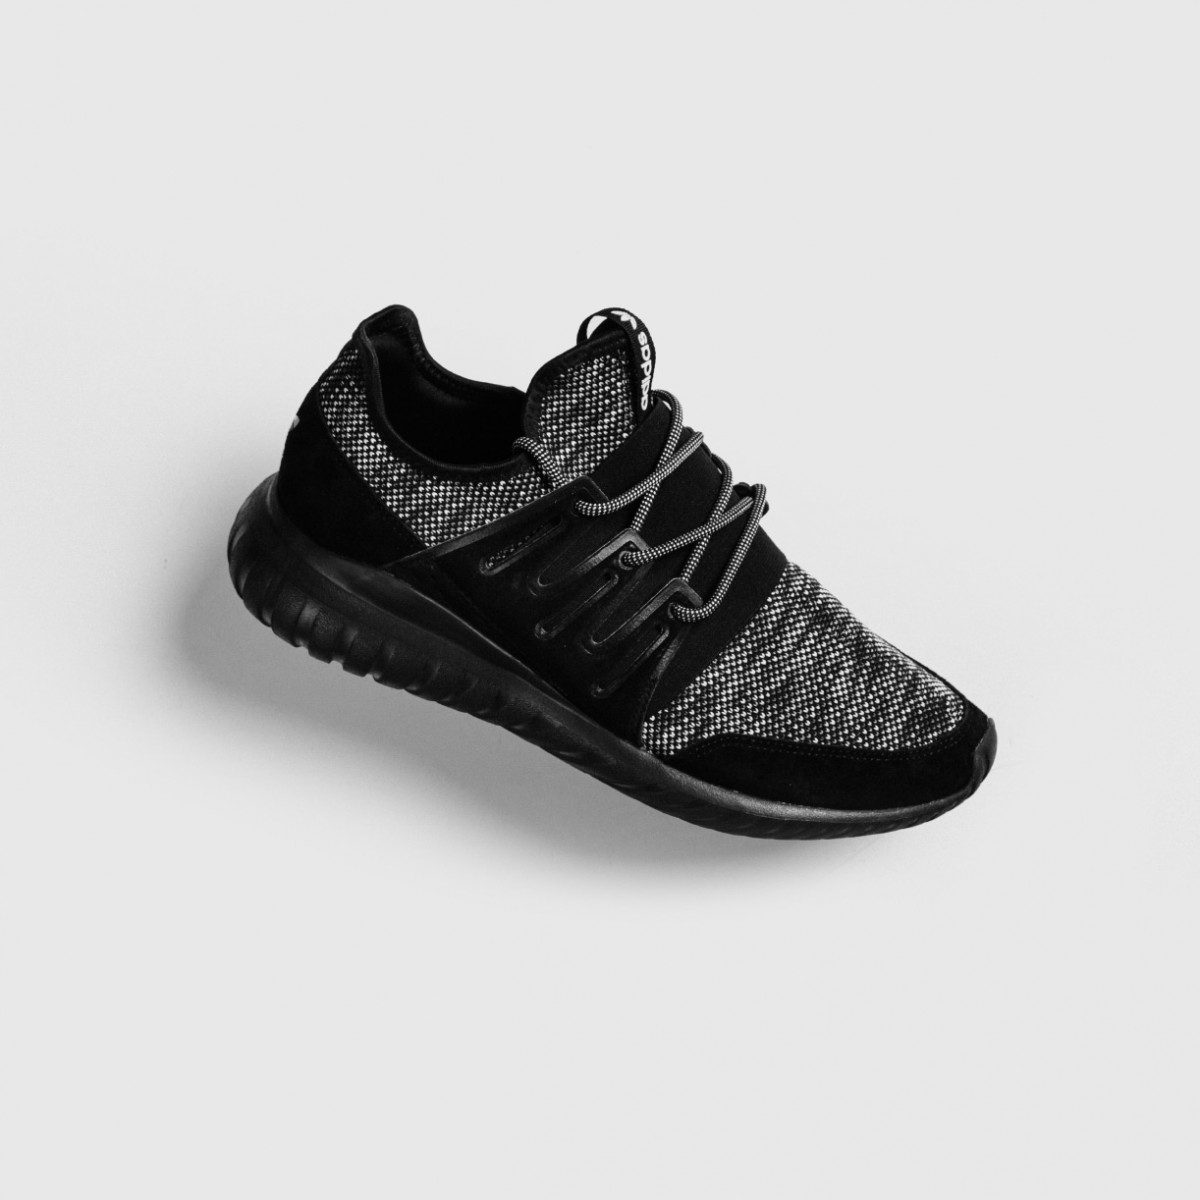 adidas-originals-tubular-radial-melange-knit-pack-3-1200x1200